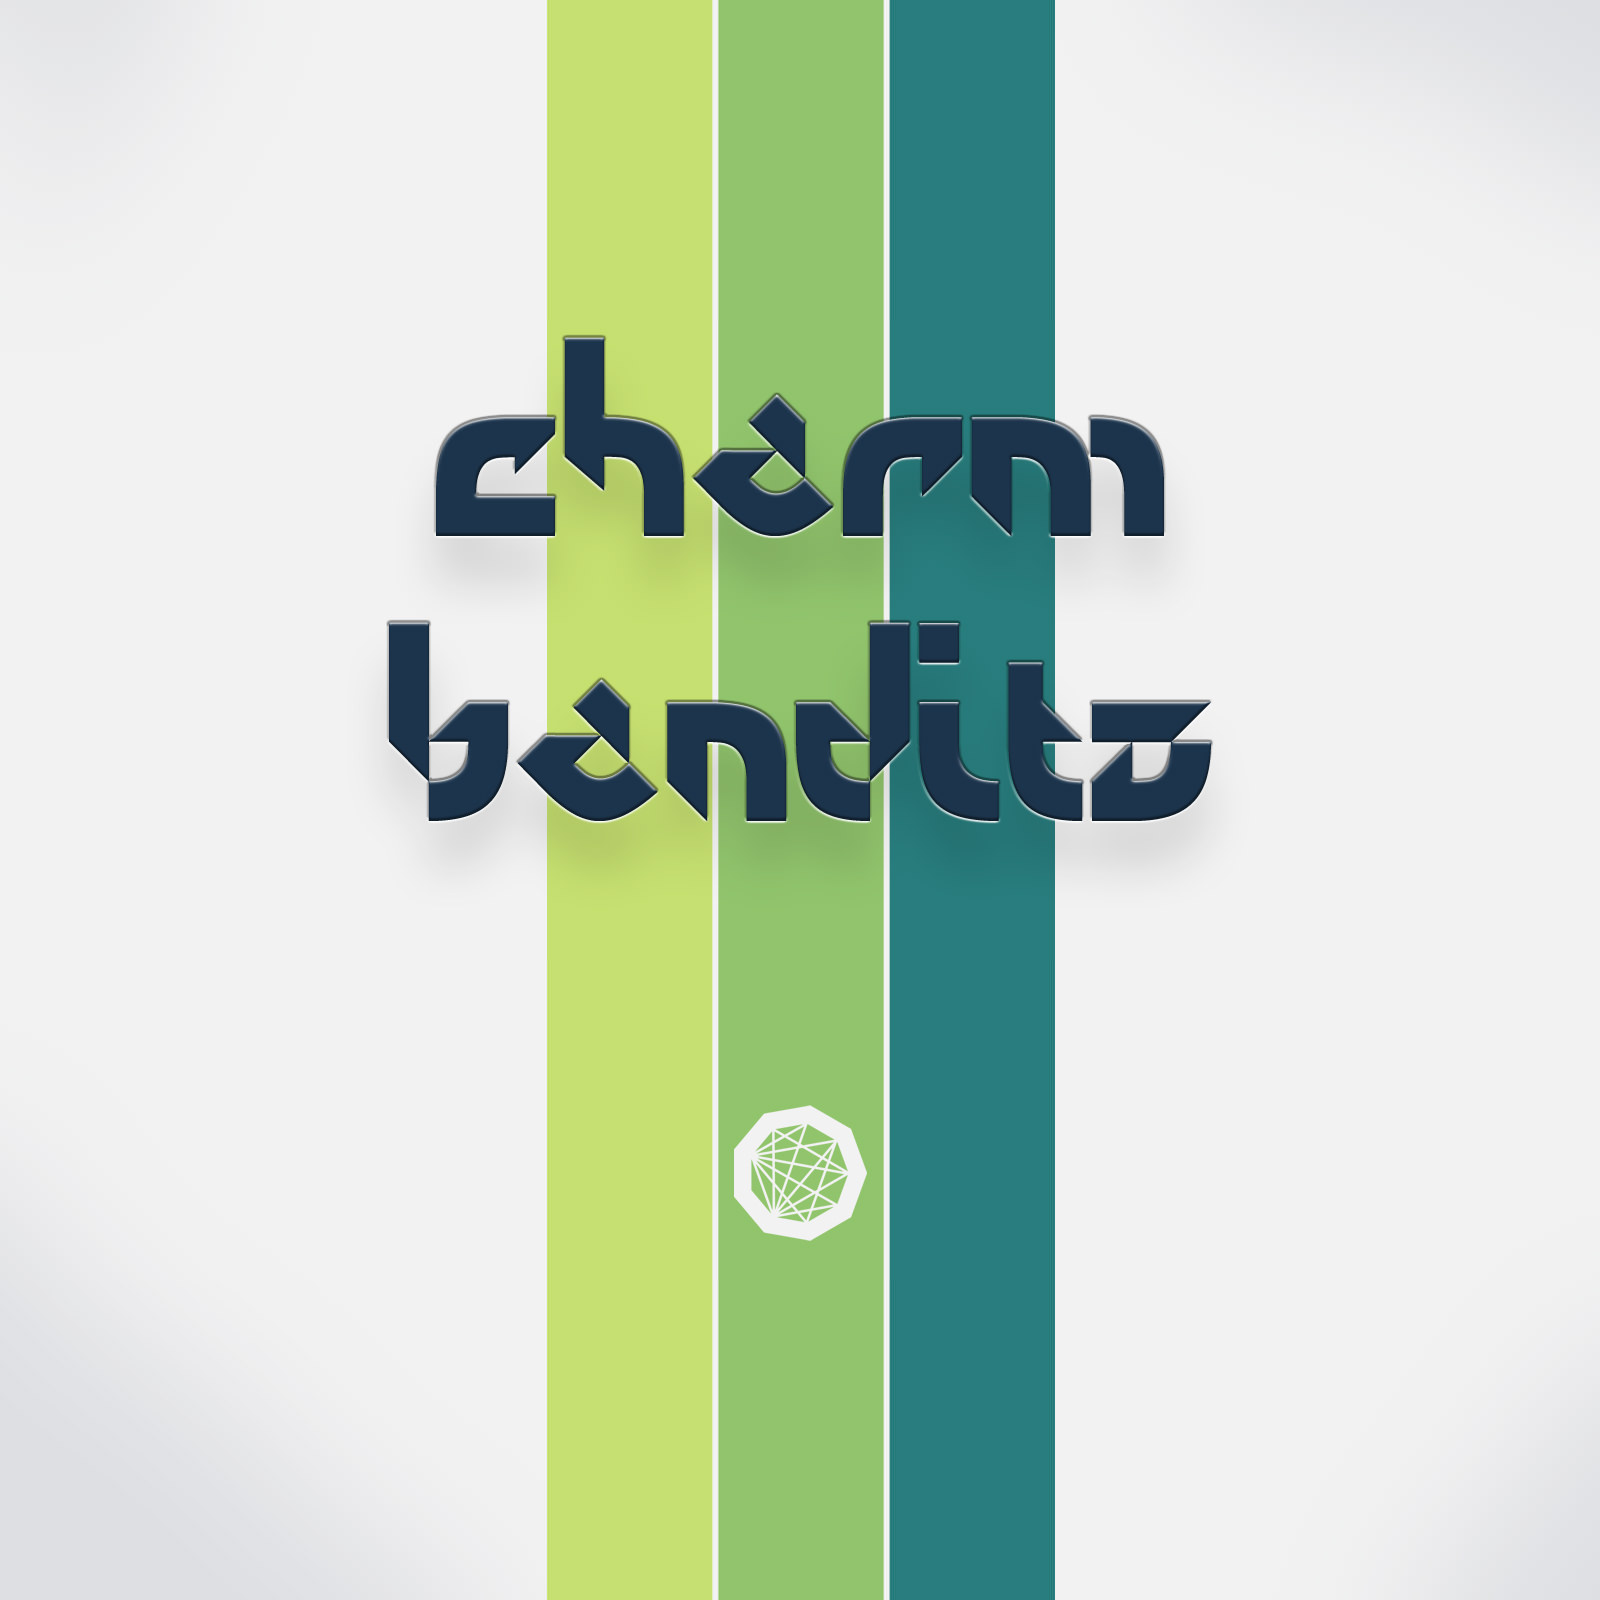 Charm Bandits by Mindless Machines Audio Lab